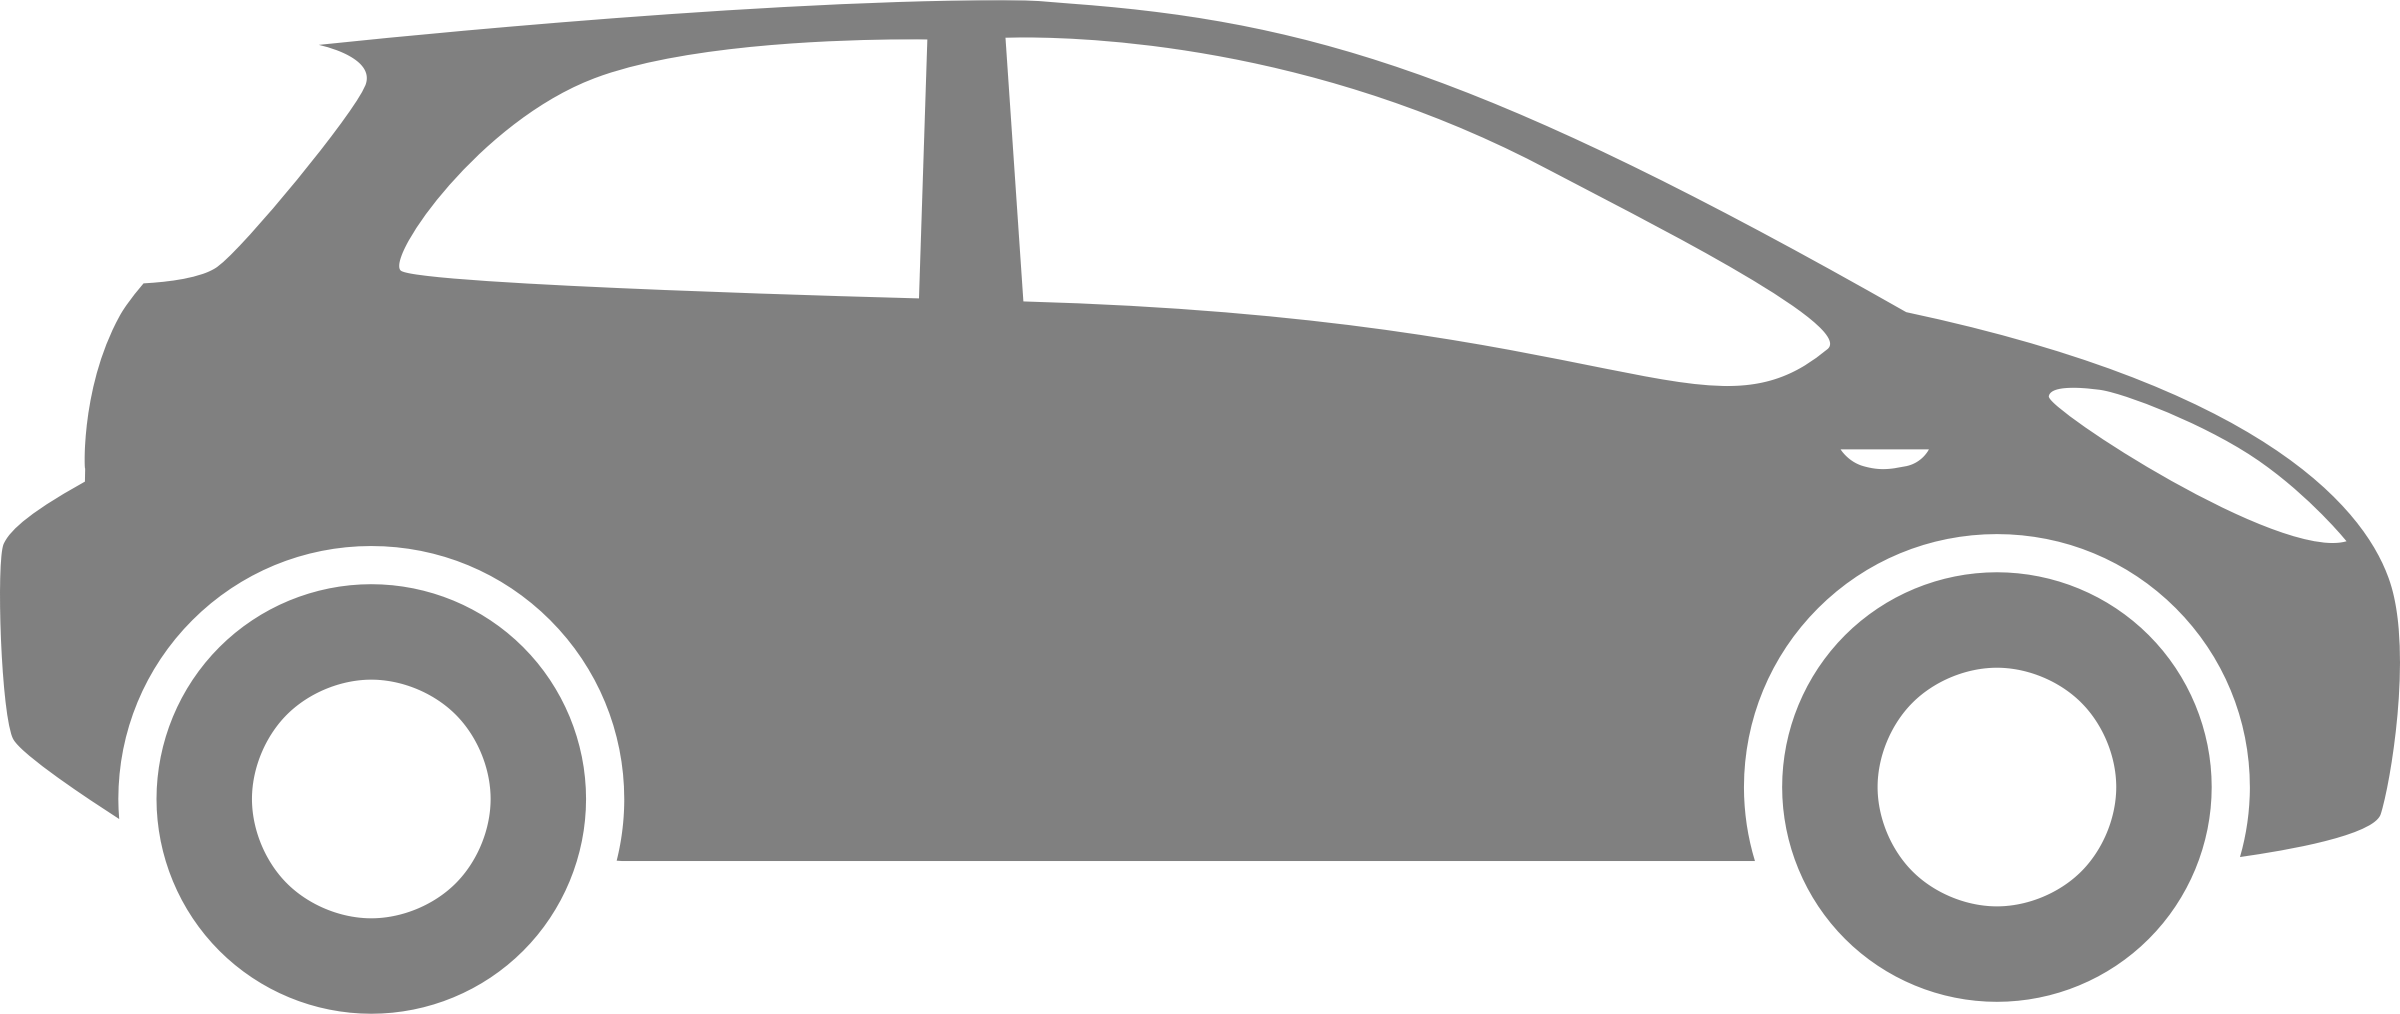 Images clip art carsjp. Clipart car vector